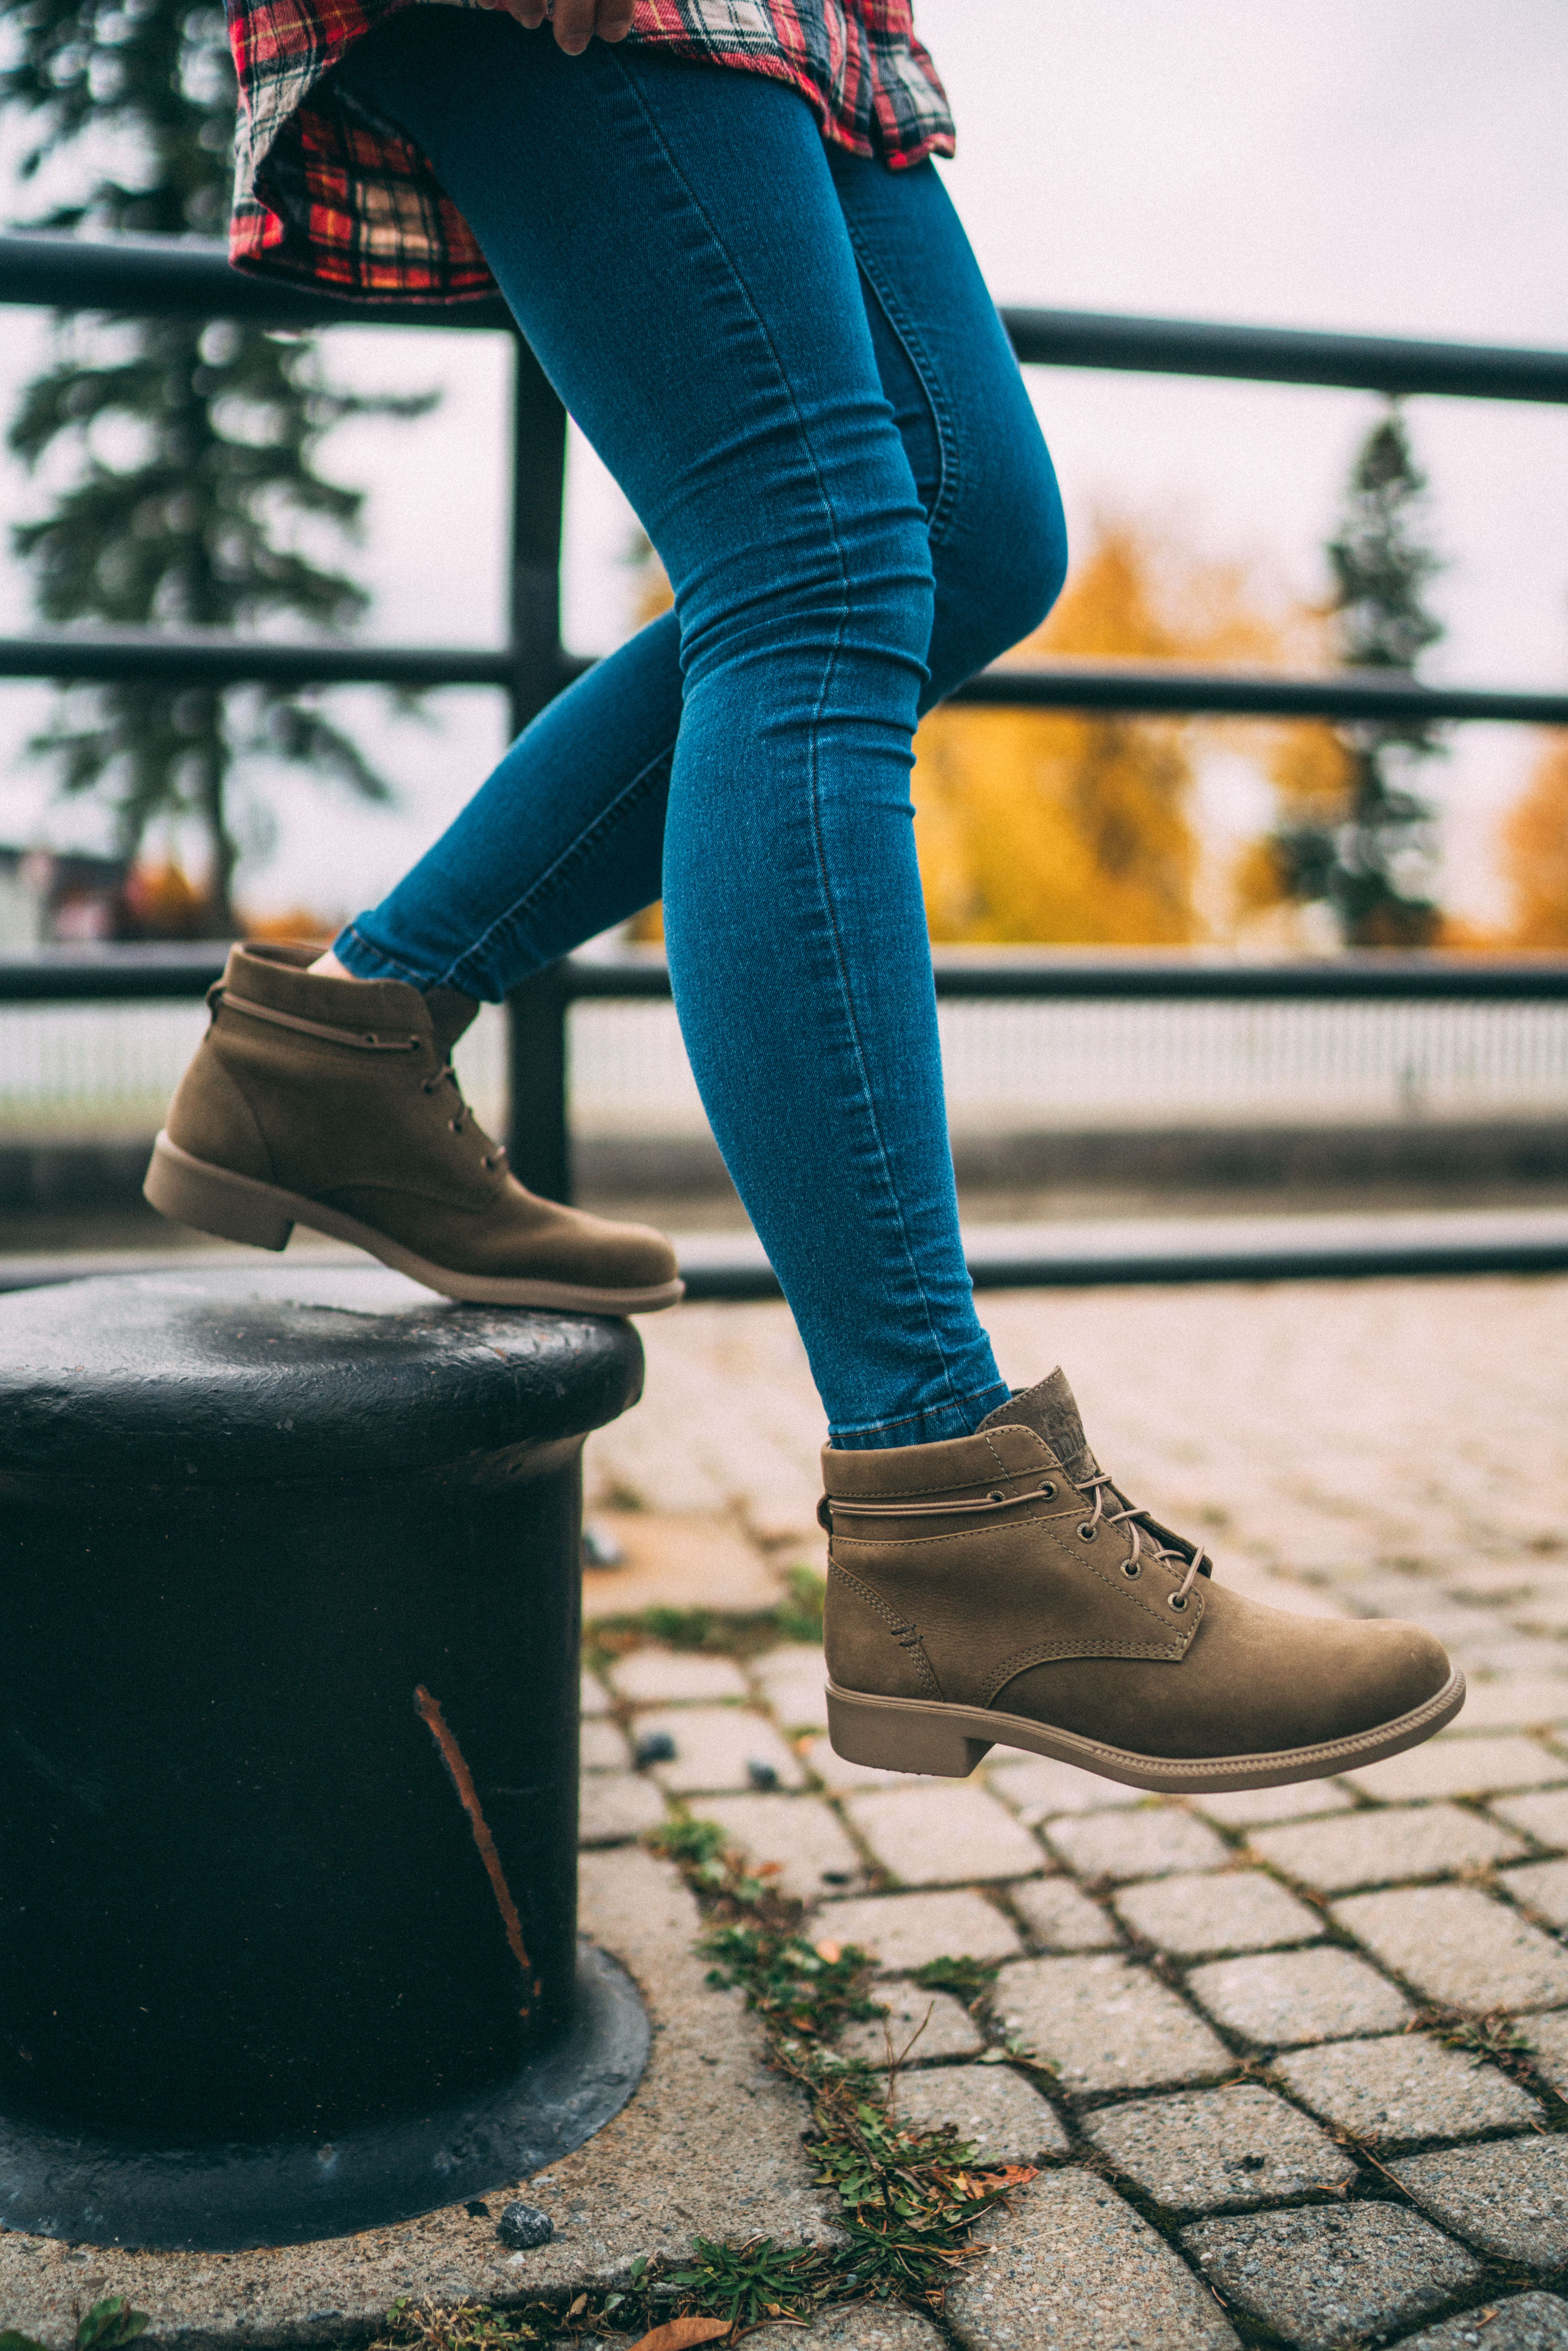 Women S Kodiak Original Wrap Waterproof Boot Canteen Women S Boots Kodiak Boots Us Wrap Boots Everyday Boots Hiking Boots Women